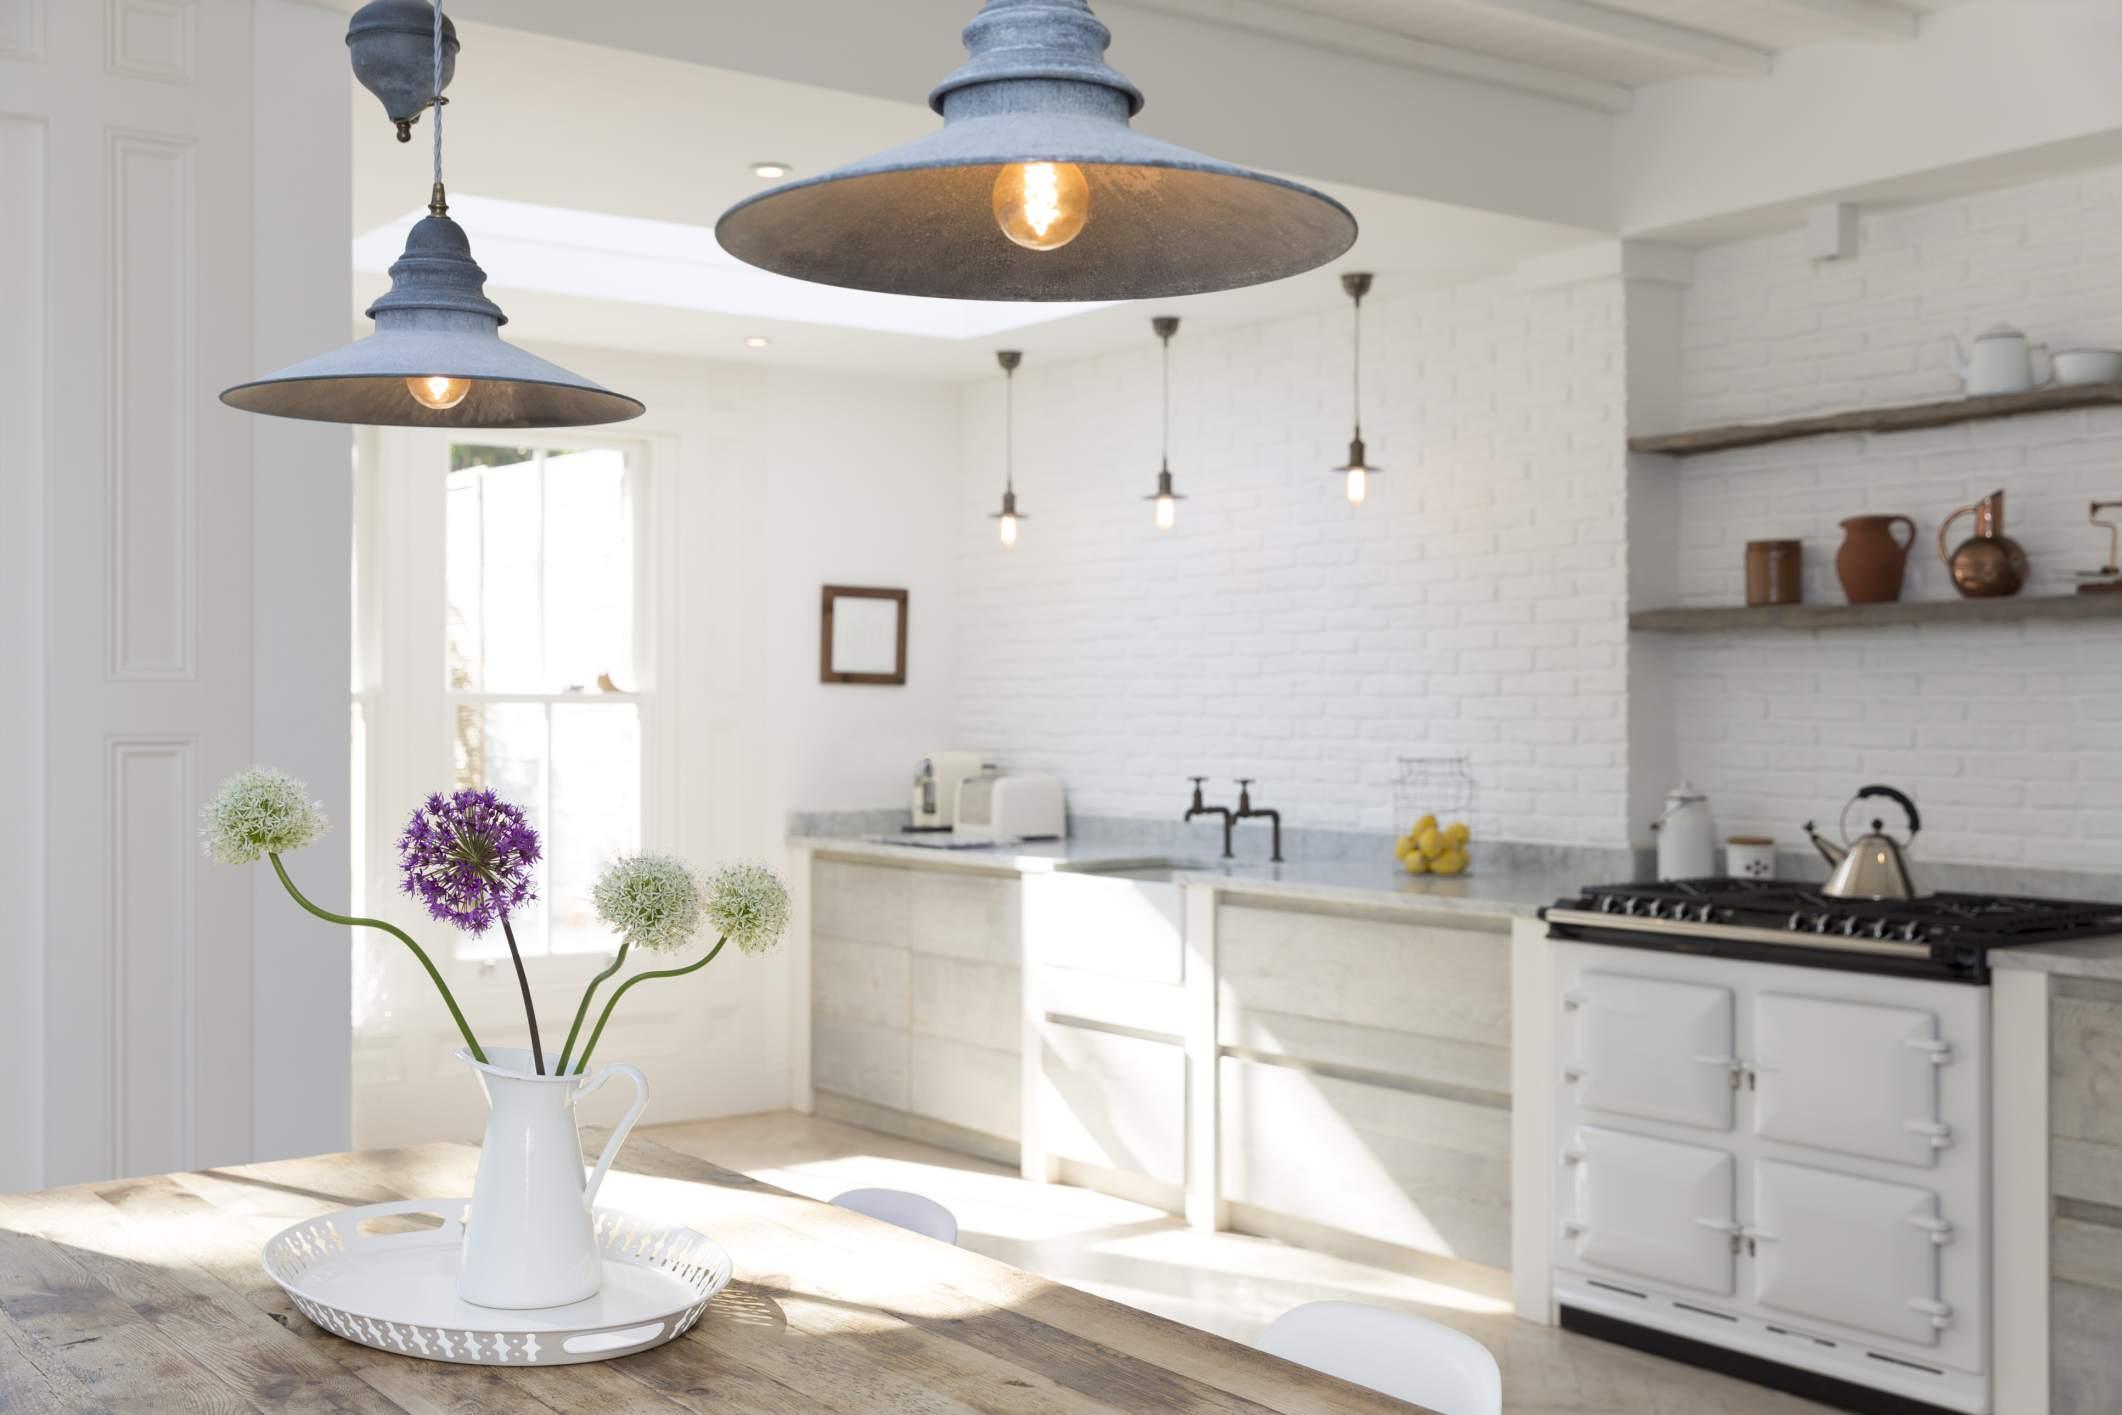 Pendant Light Ideas for Your Kitchen